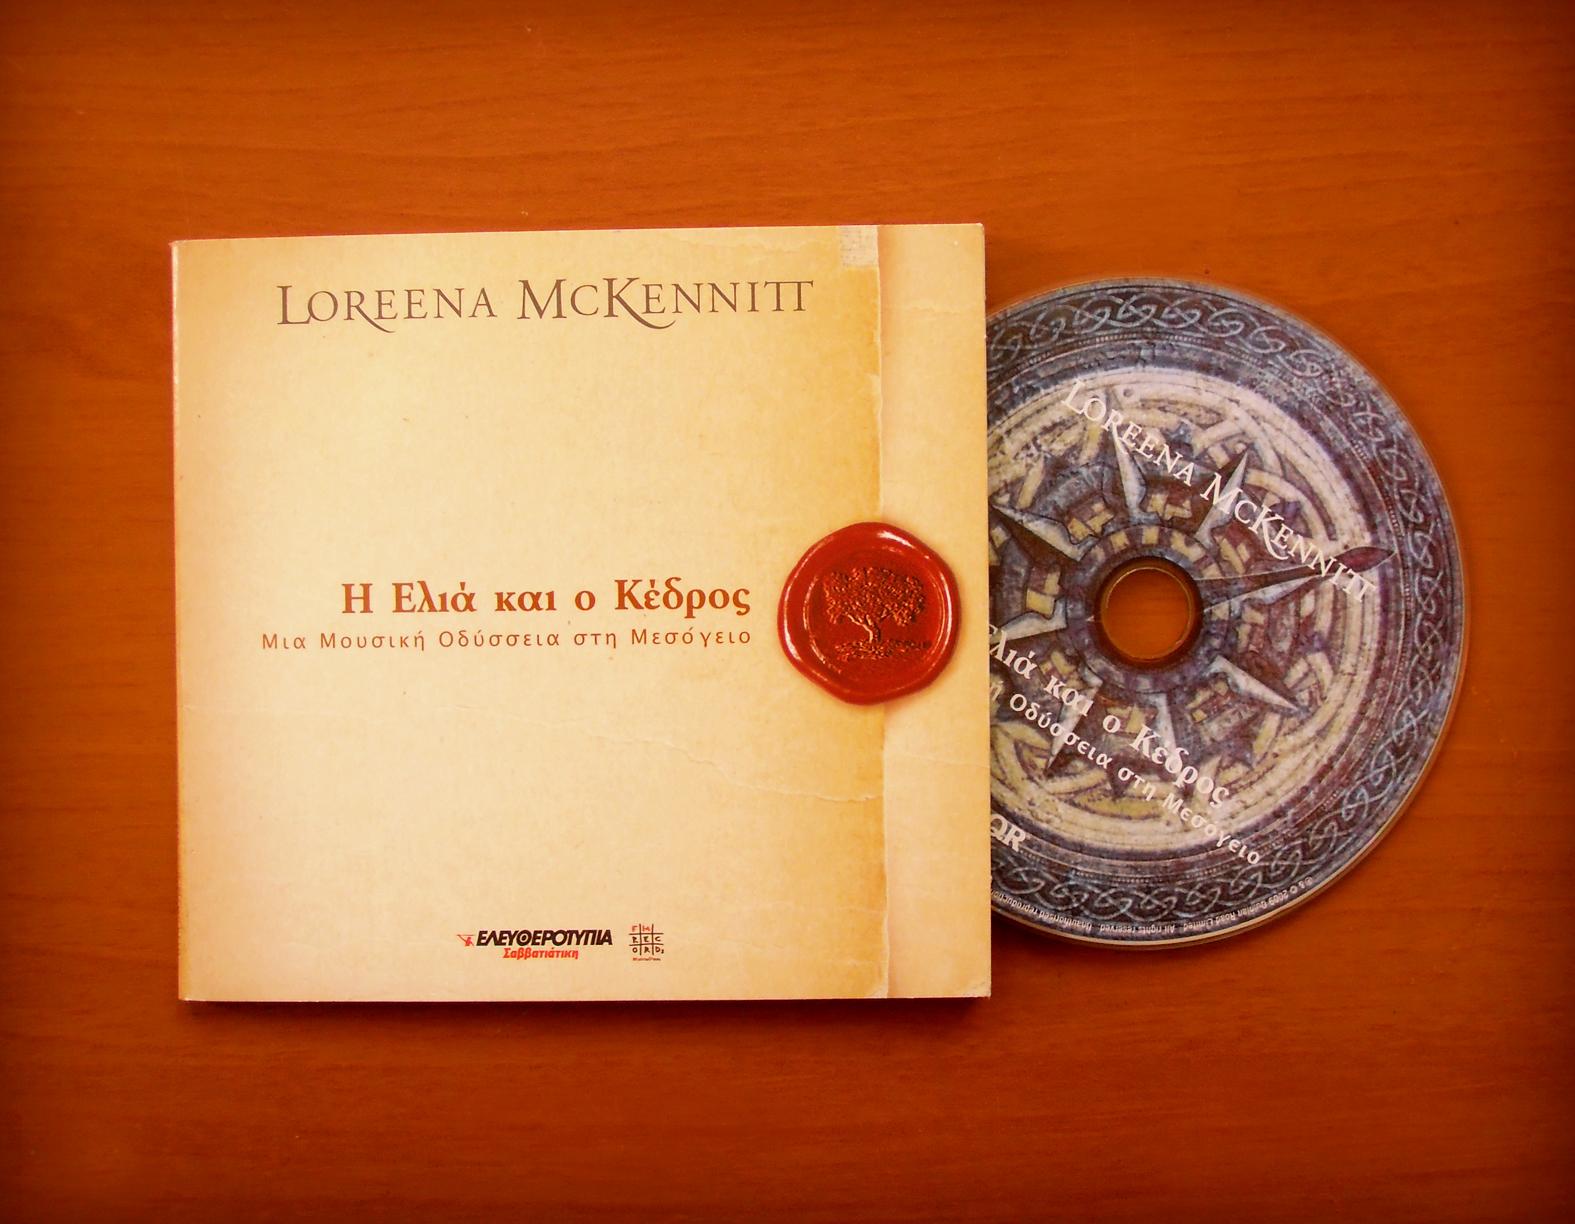 loreena mckennitt collection 2009 u2013 η ελιά και ο κέδρος the